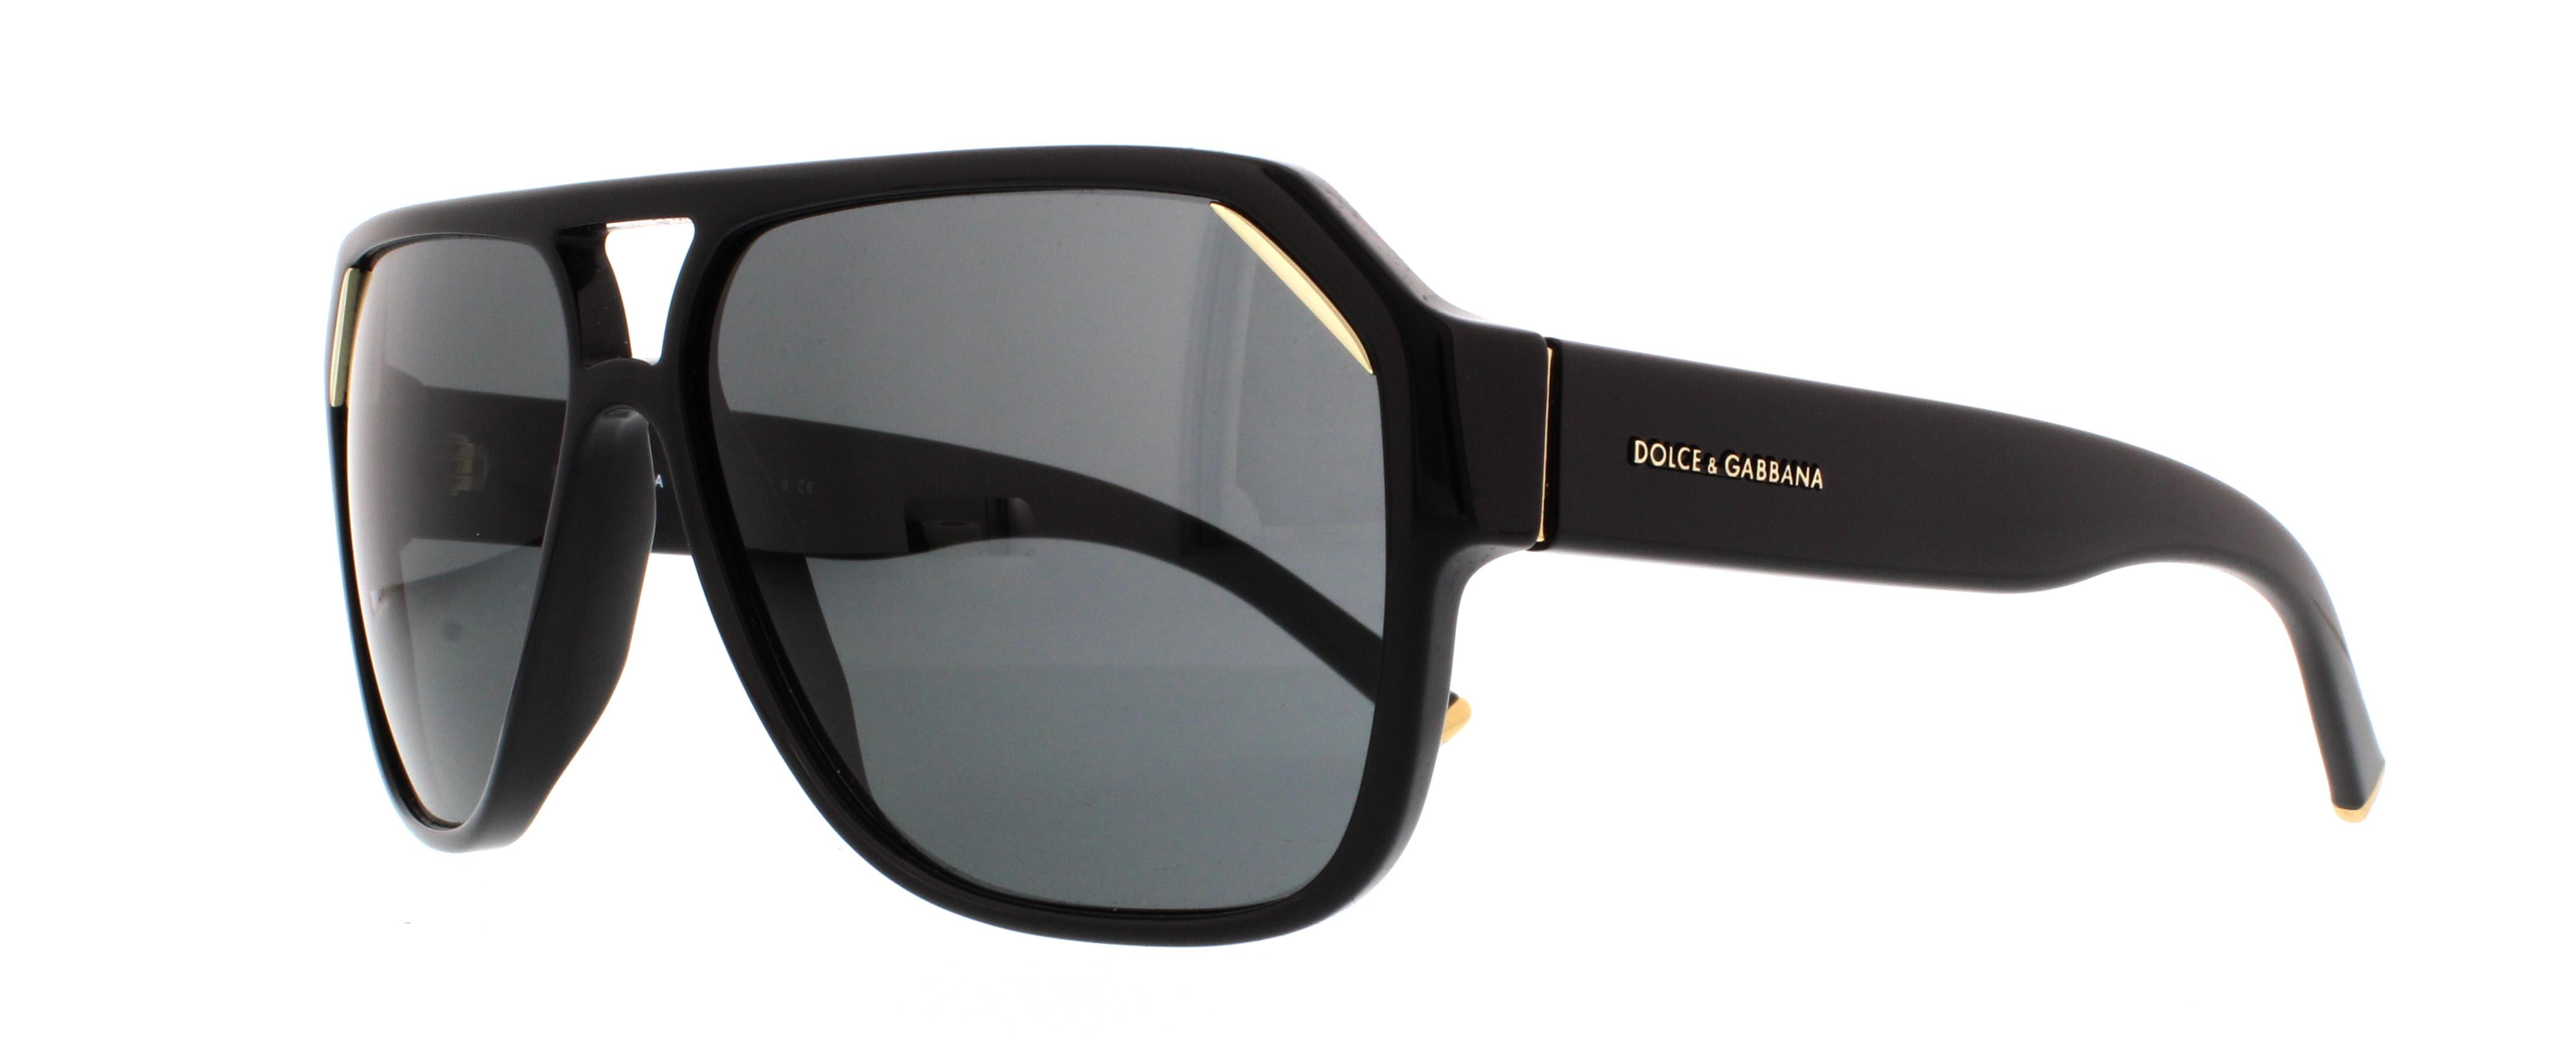 Dolce Gabbana Sunglasses Warranty David Simchi Levi